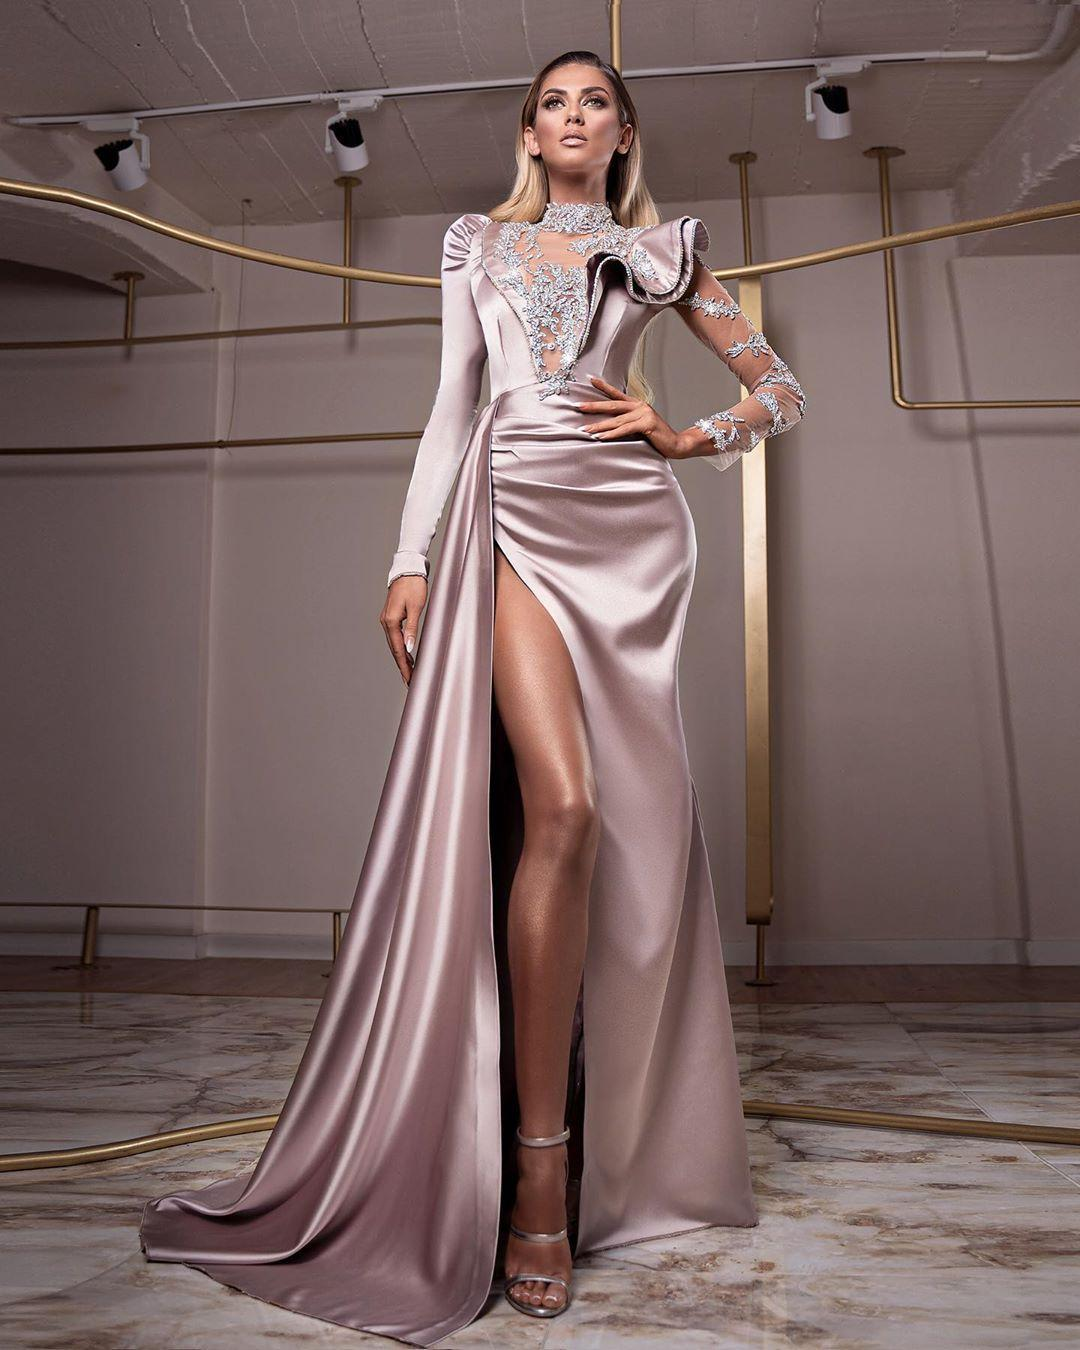 2020 Arabic ASO EBI Dentelle Robes de soirée perlée Sirène Manches longues Robes de bal de promo